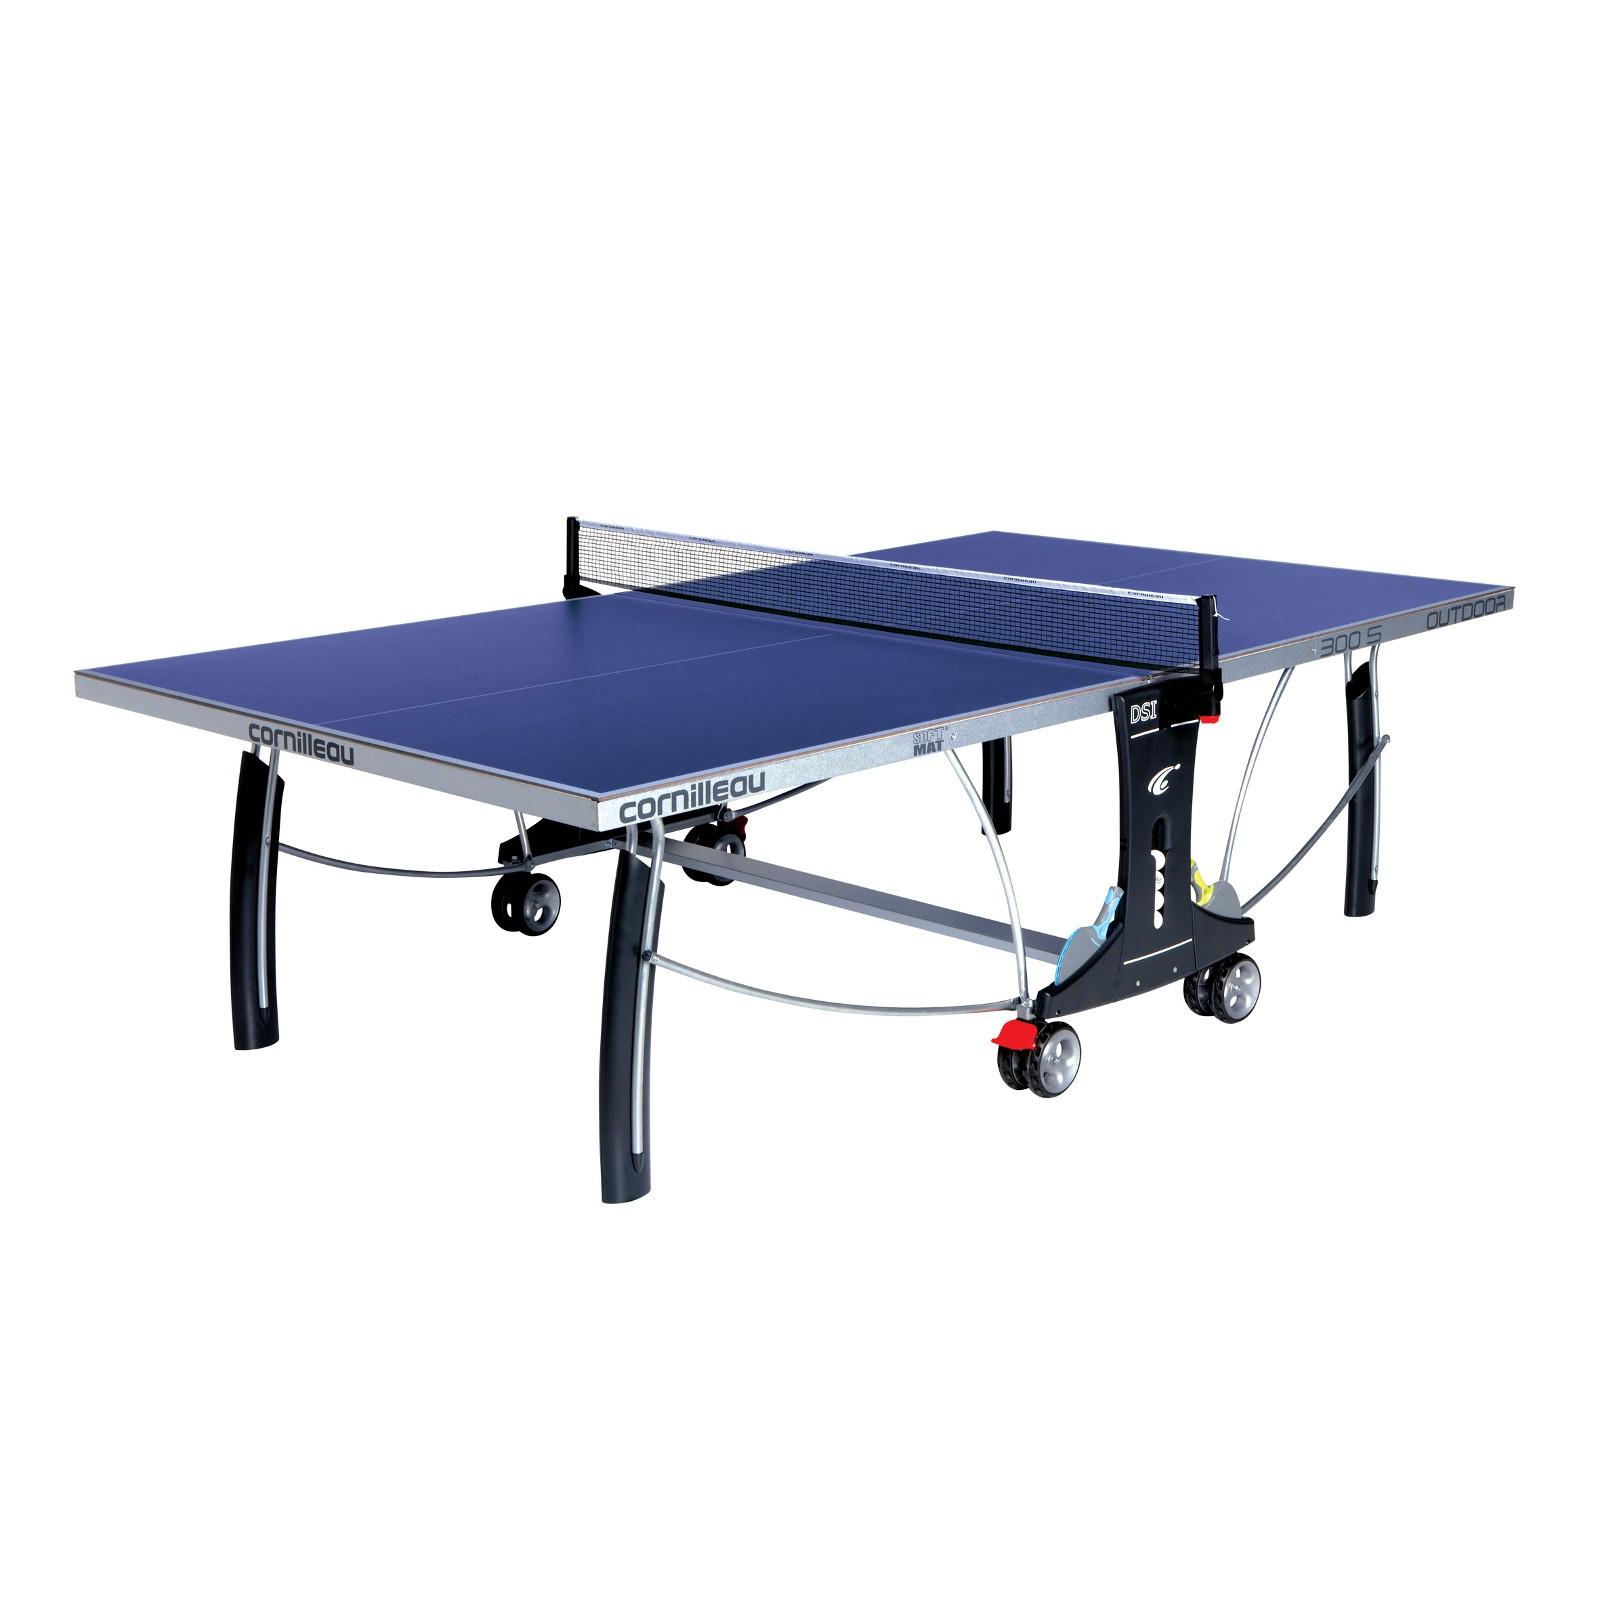 cornilleau outdoor tischtennisplatte sport 300 s g nstig. Black Bedroom Furniture Sets. Home Design Ideas